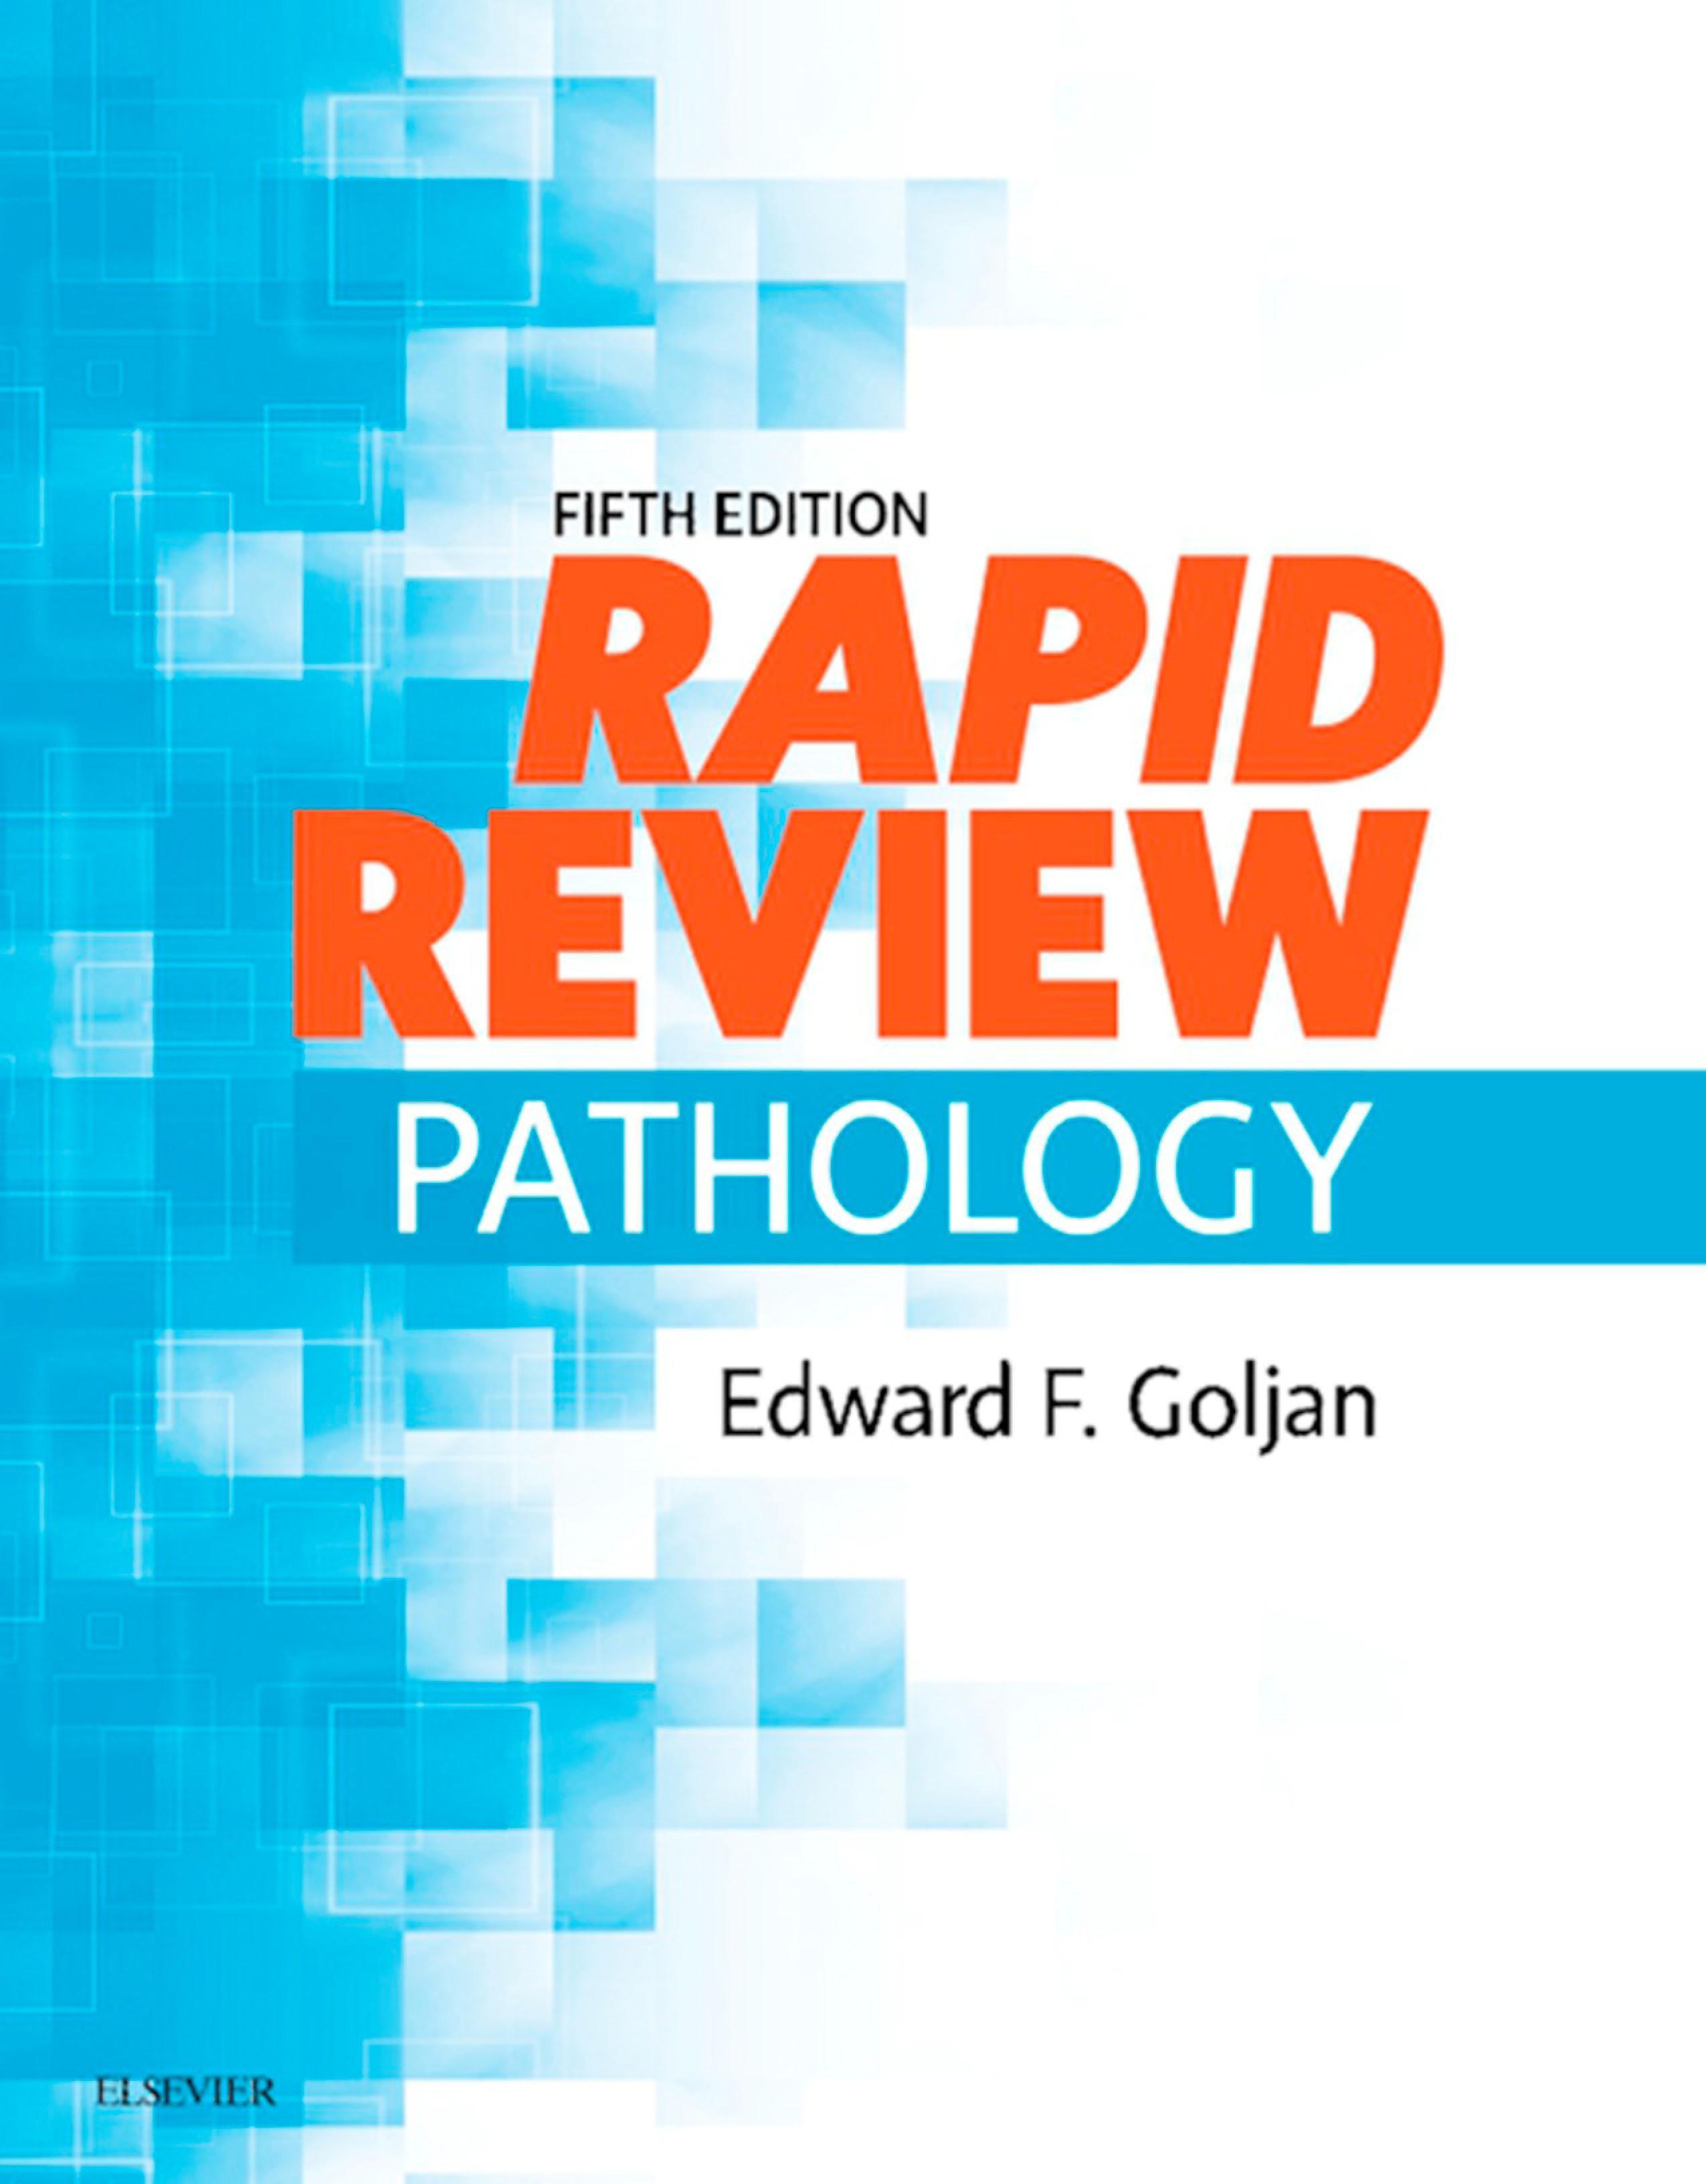 Usmle step 1 pathology questions pdf | BRS Pathology 5th